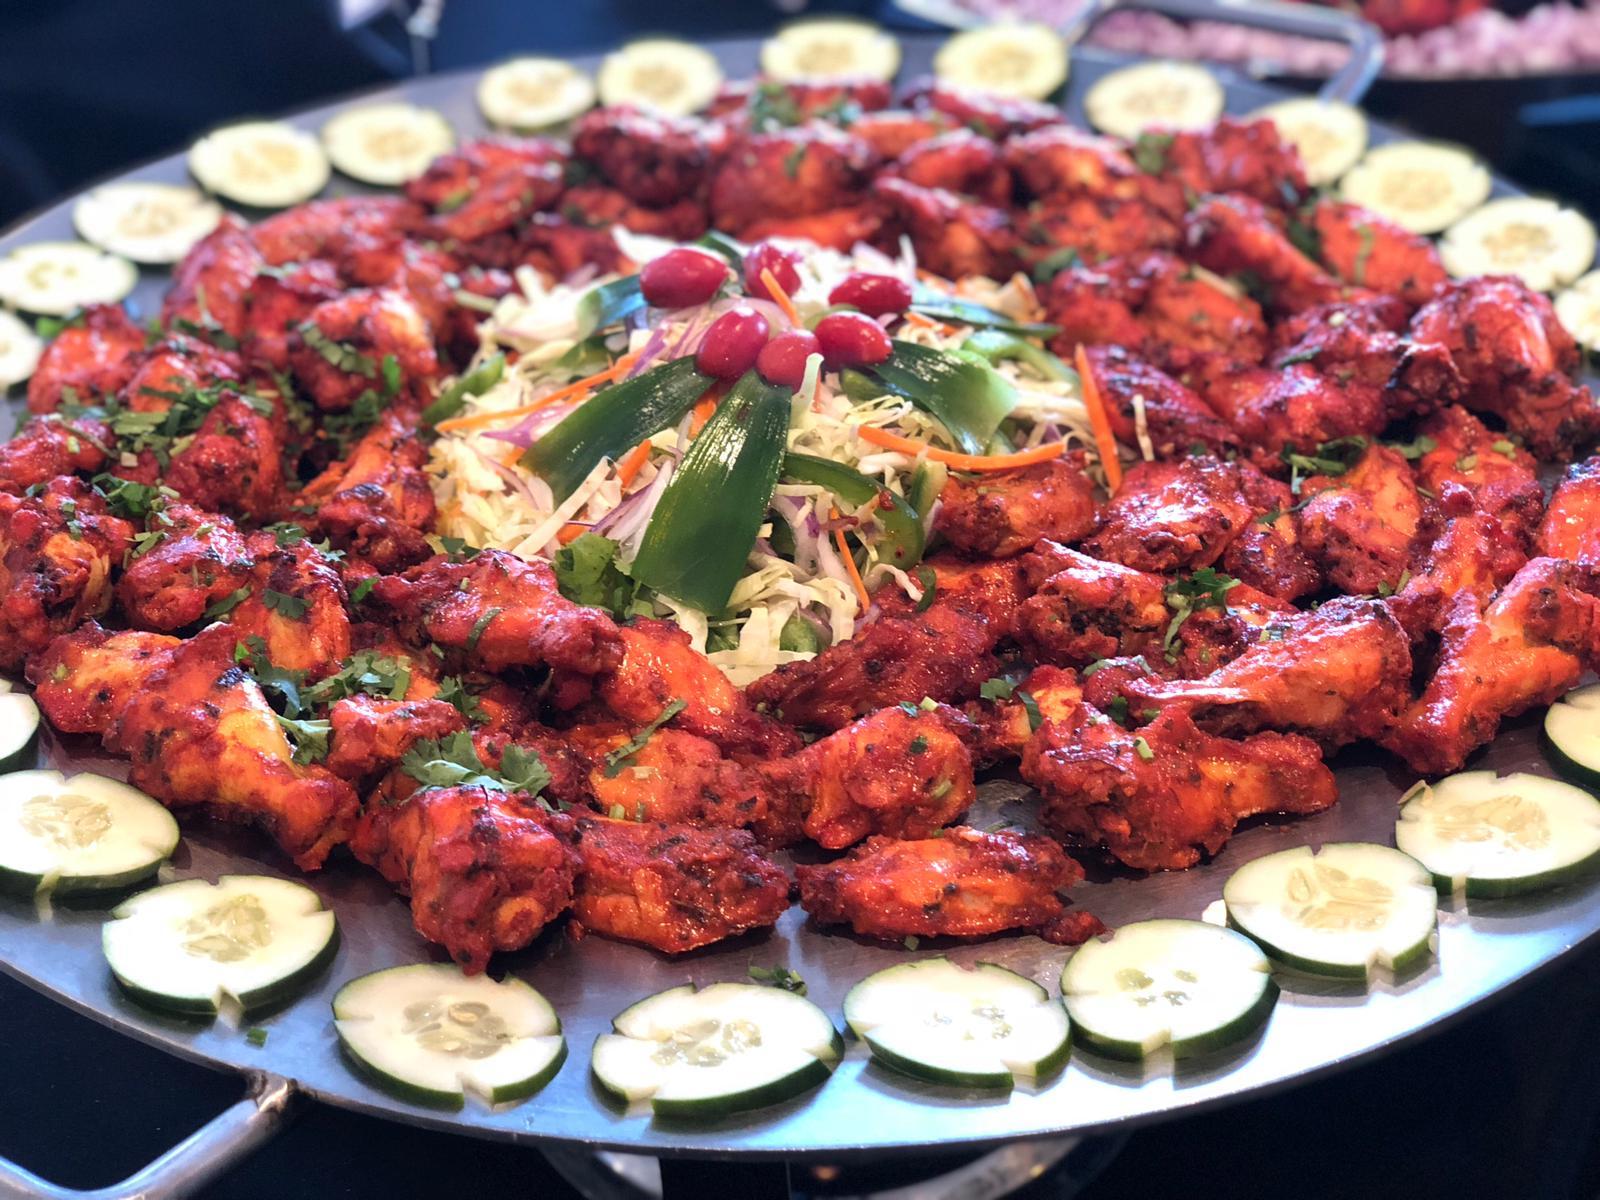 Amaravati Indian Cuisine Brentwood Tn Home Order Online